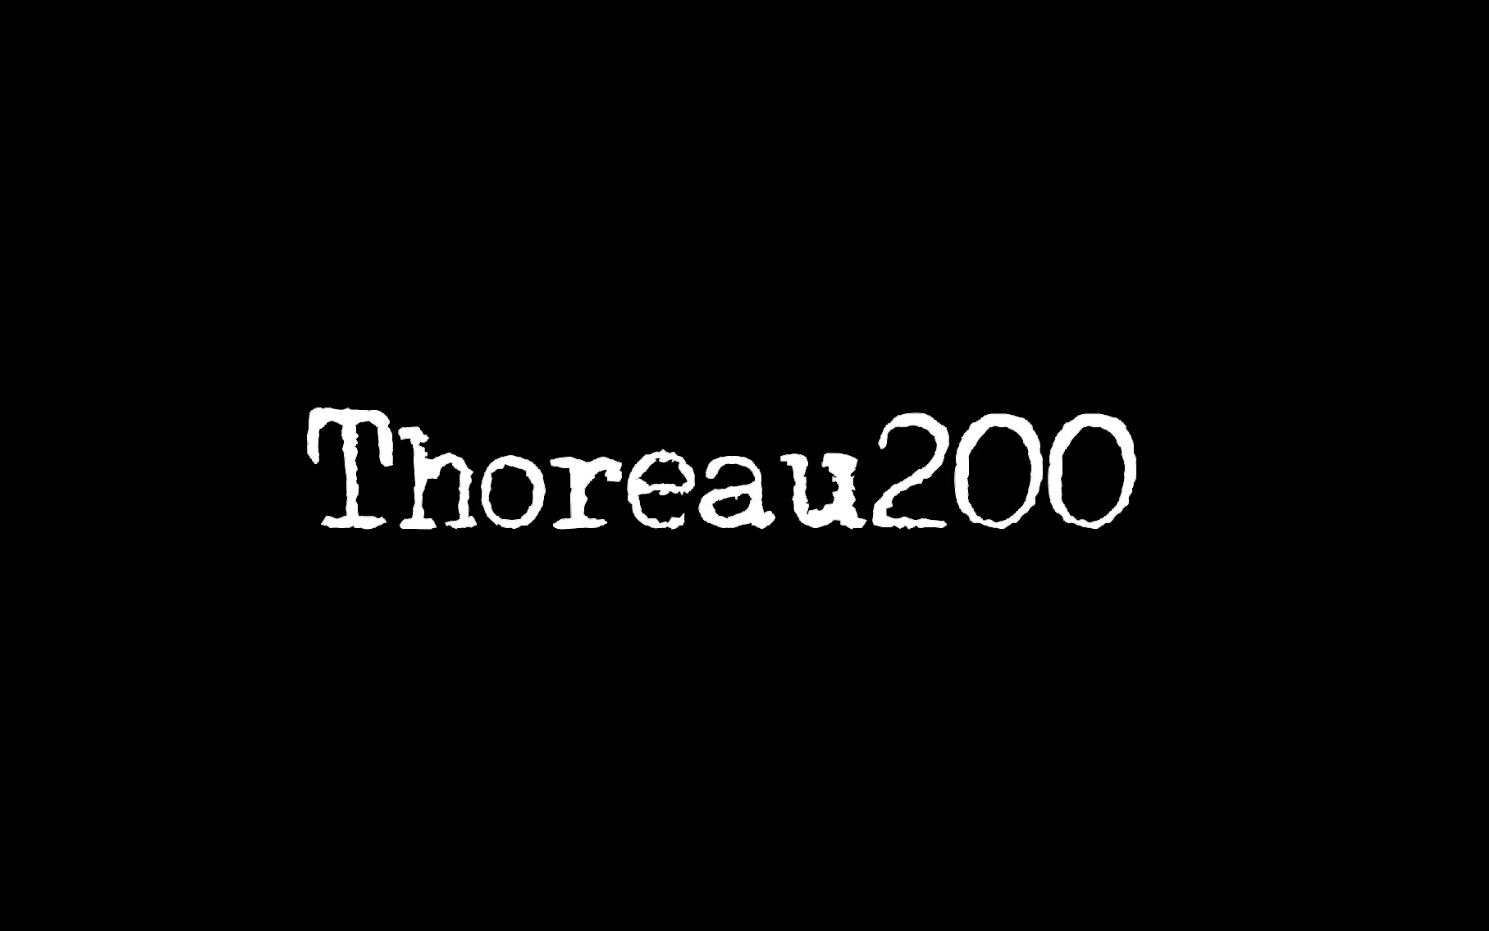 Thoreau200